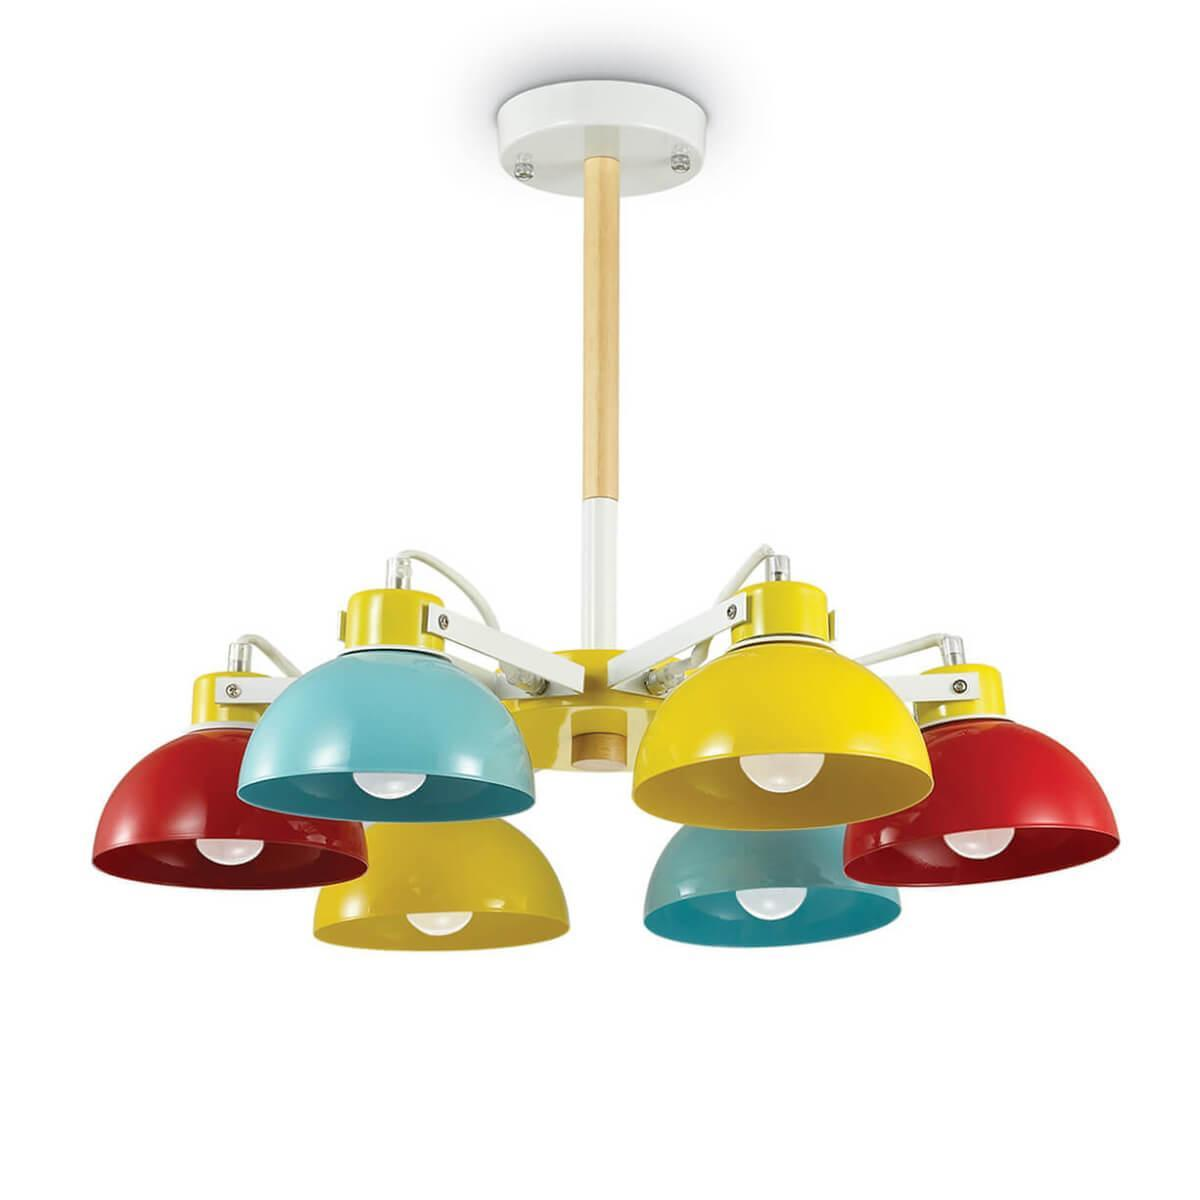 Потолочный светильник Ideal Lux Titti PL6, E27, 60 Вт светильник ideal lux corallo corallo pl6